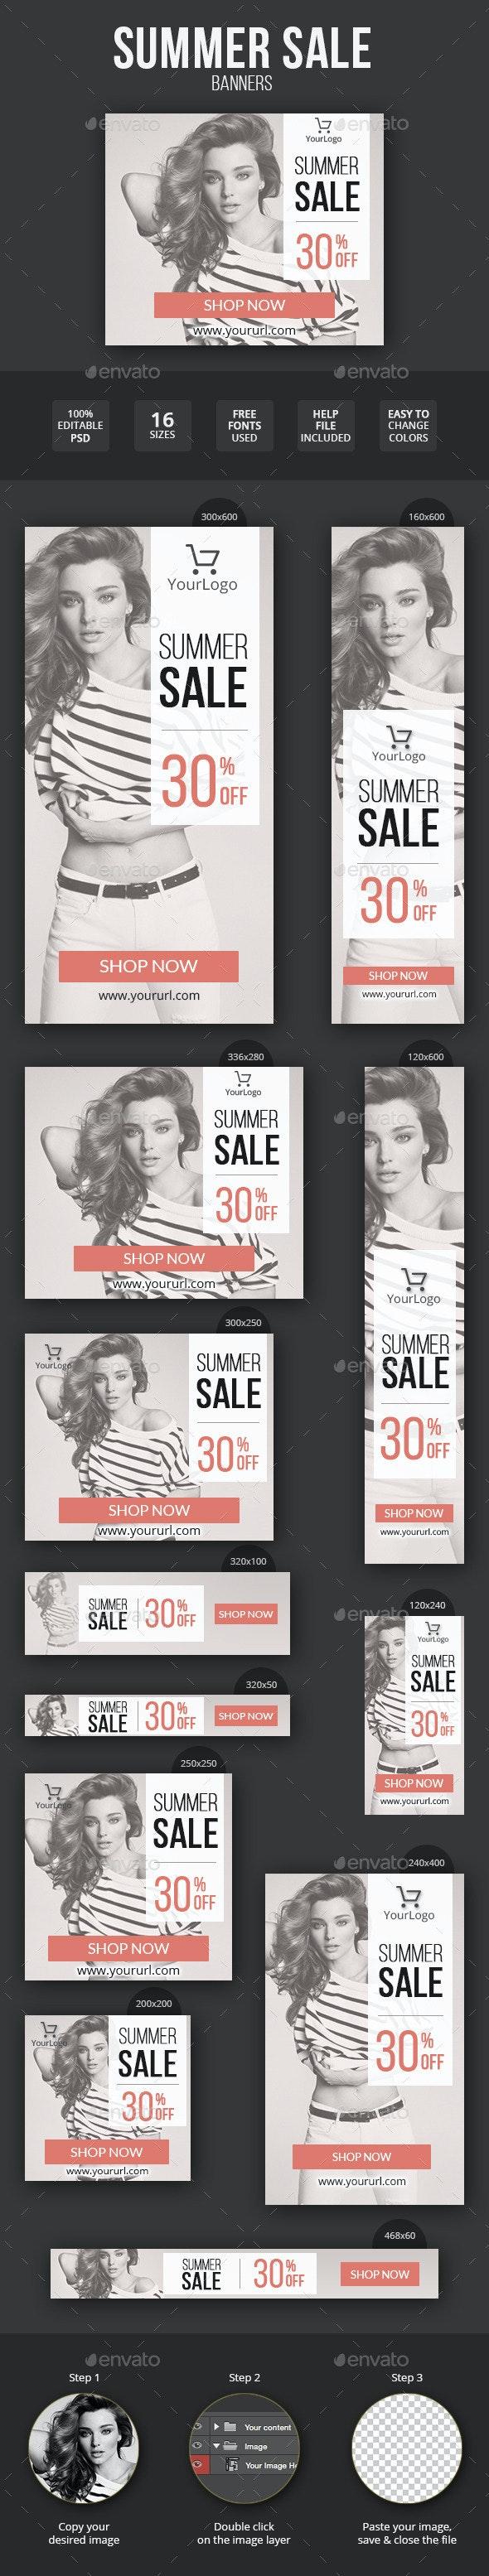 Summer Sale Fashion Banner Set - Banners & Ads Web Elements